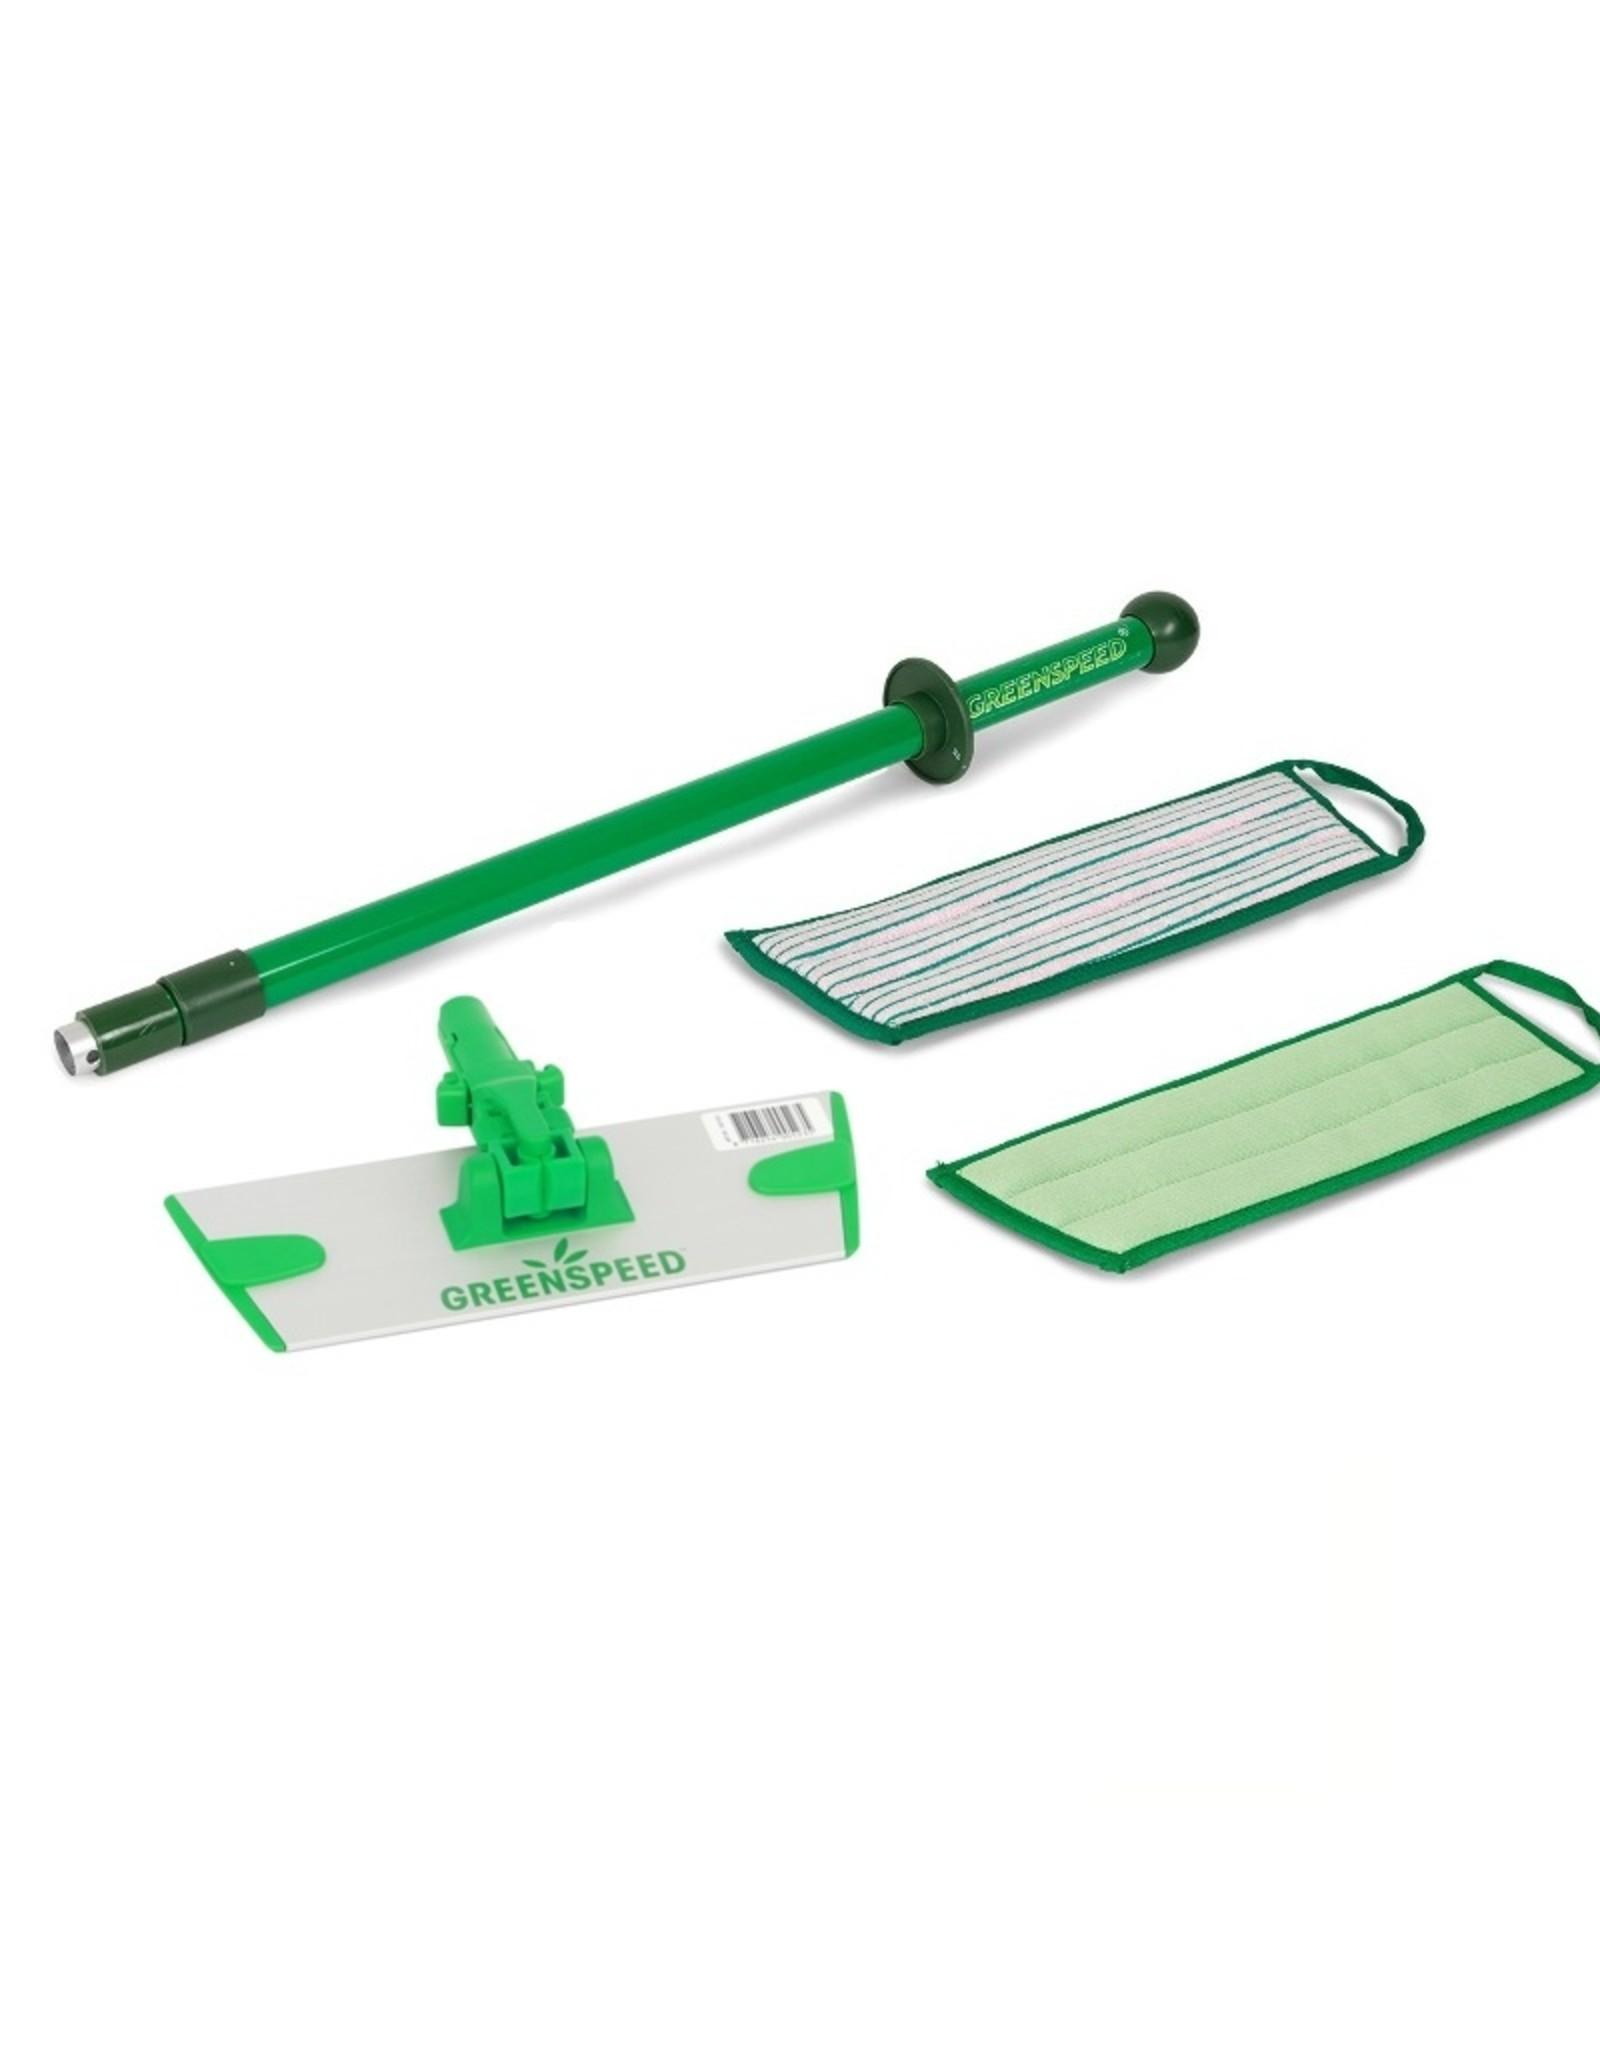 Greenspeed Ideale set met telescoopsteel, plaat en vlakmoppen